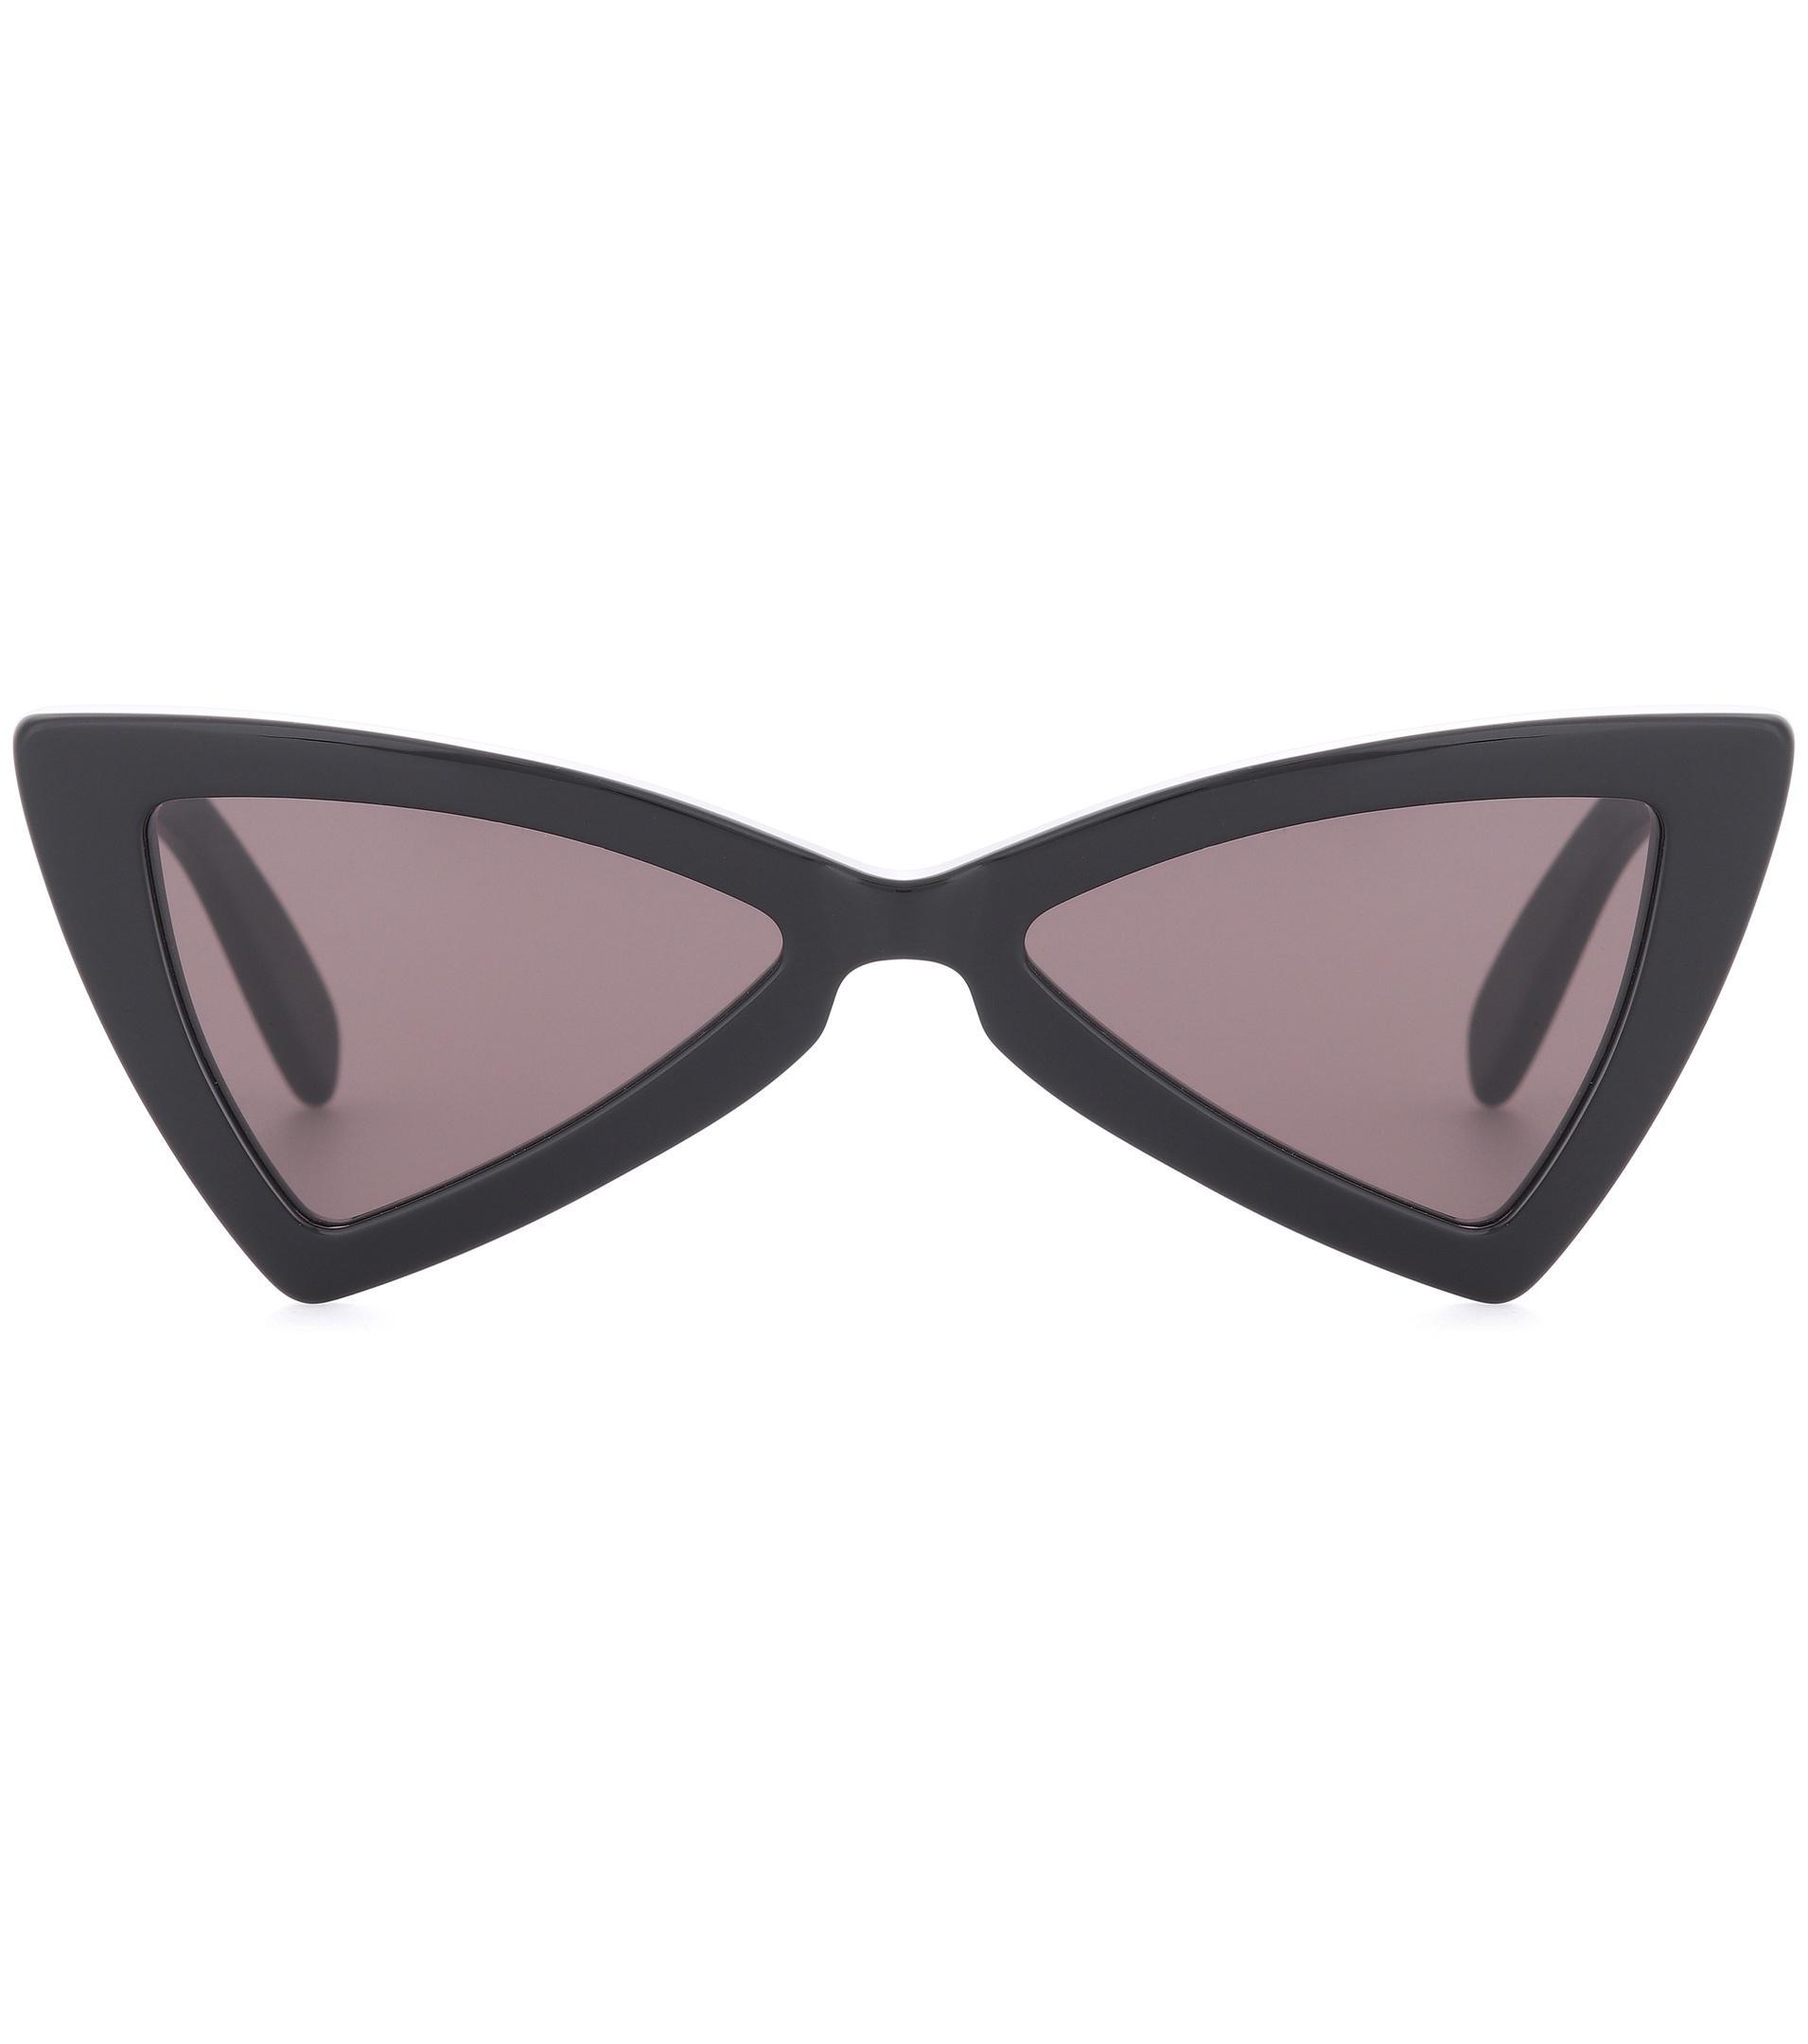 cfb294b6bc Lyst - Saint Laurent Jerry Sunglasses in Black - Save 26%